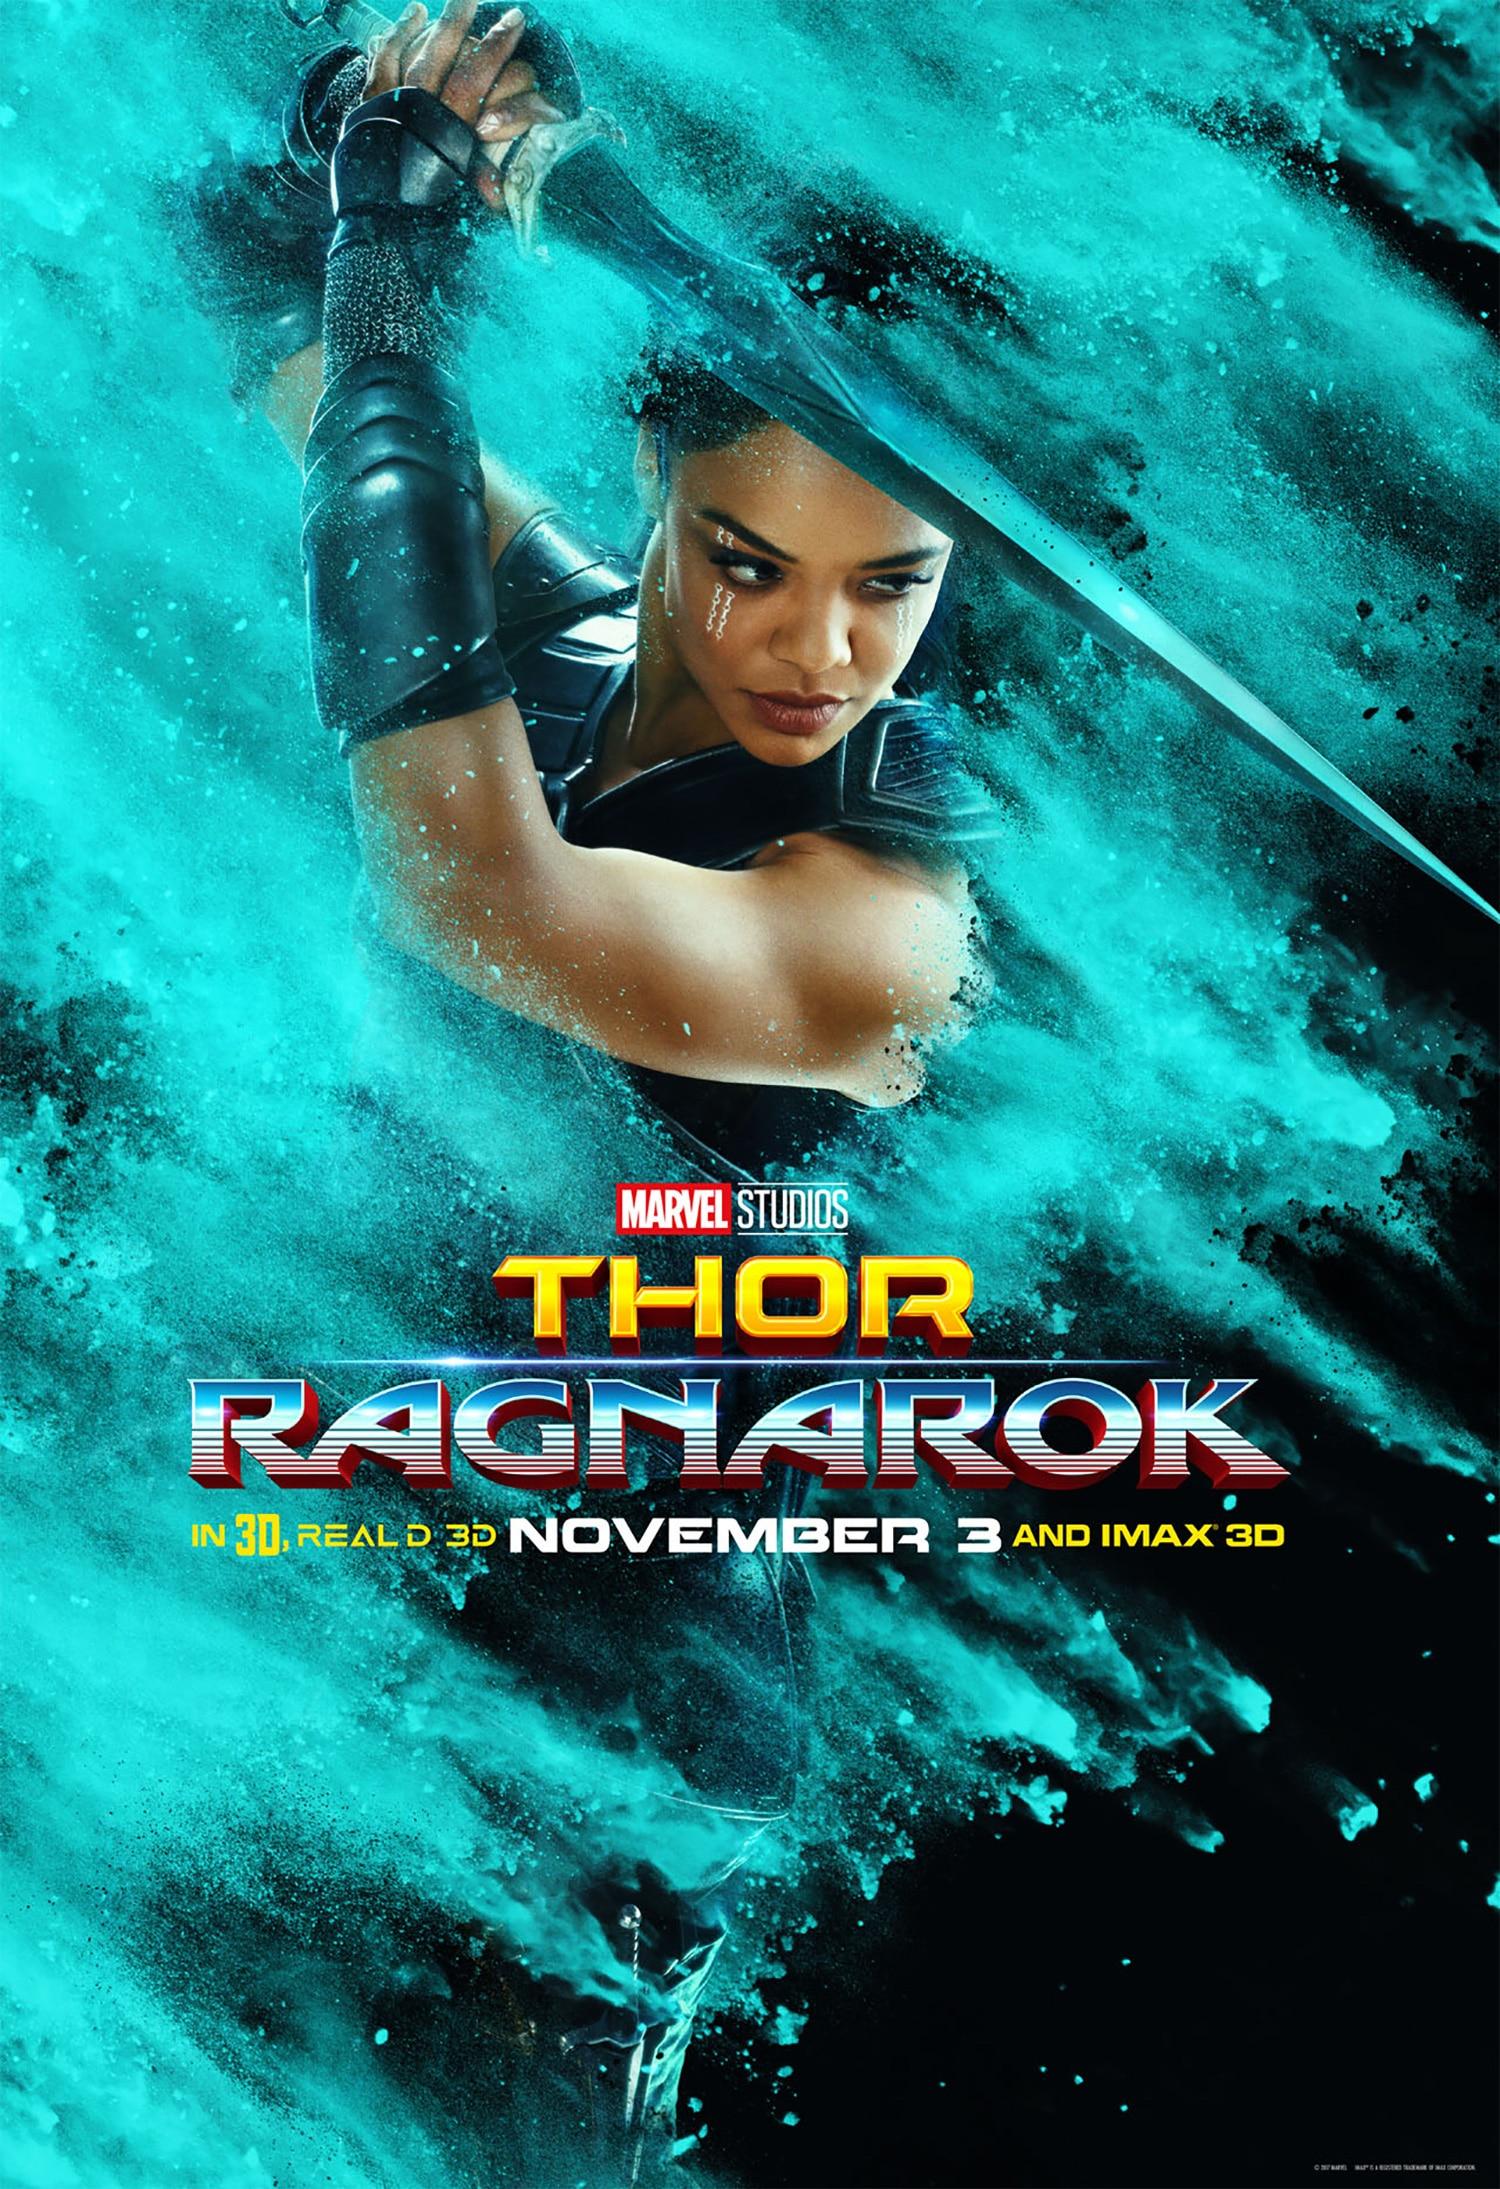 Thor-Ragnarok-HD-printable-posters-scrapper-142-valkyrie-brunnhilde